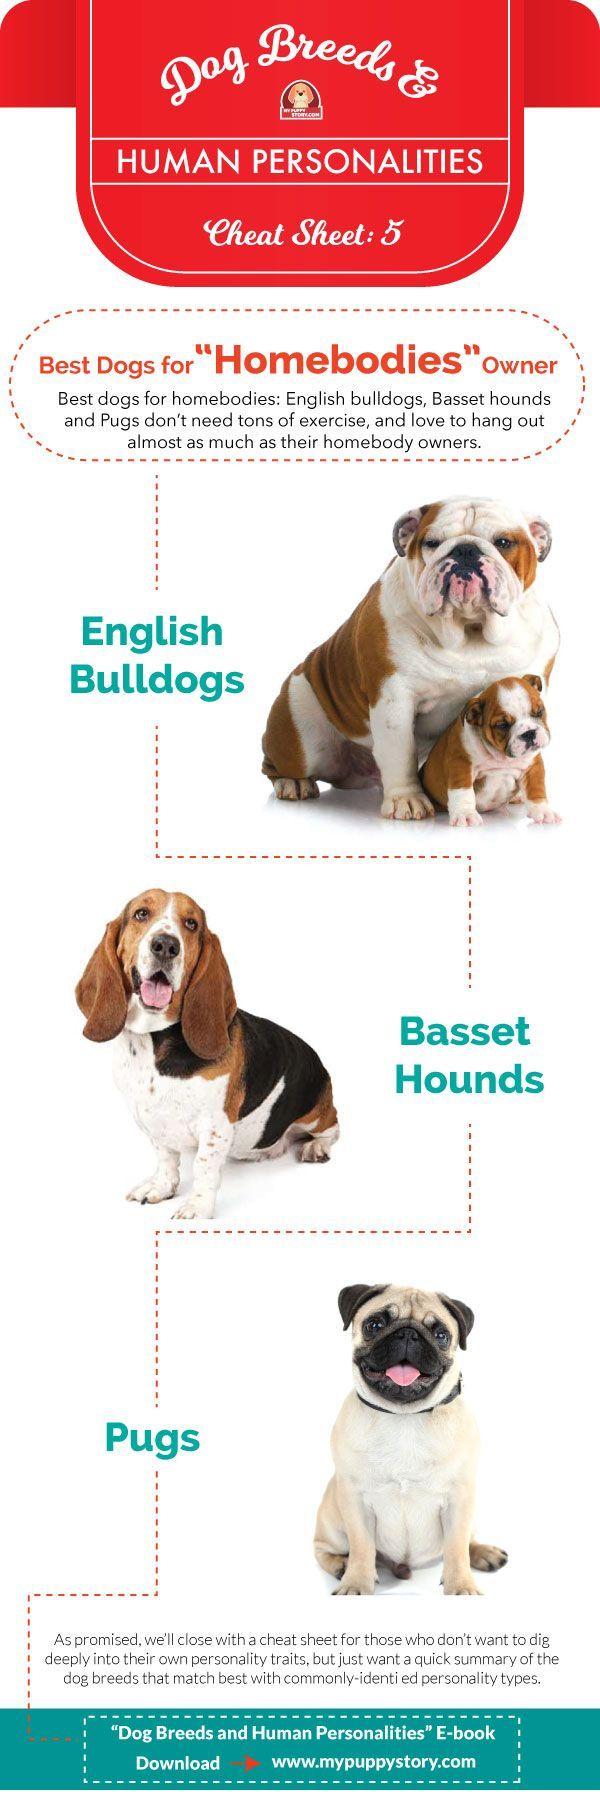 Dog Breeds Vs Human Personalities Dog Breeds Dogs Human